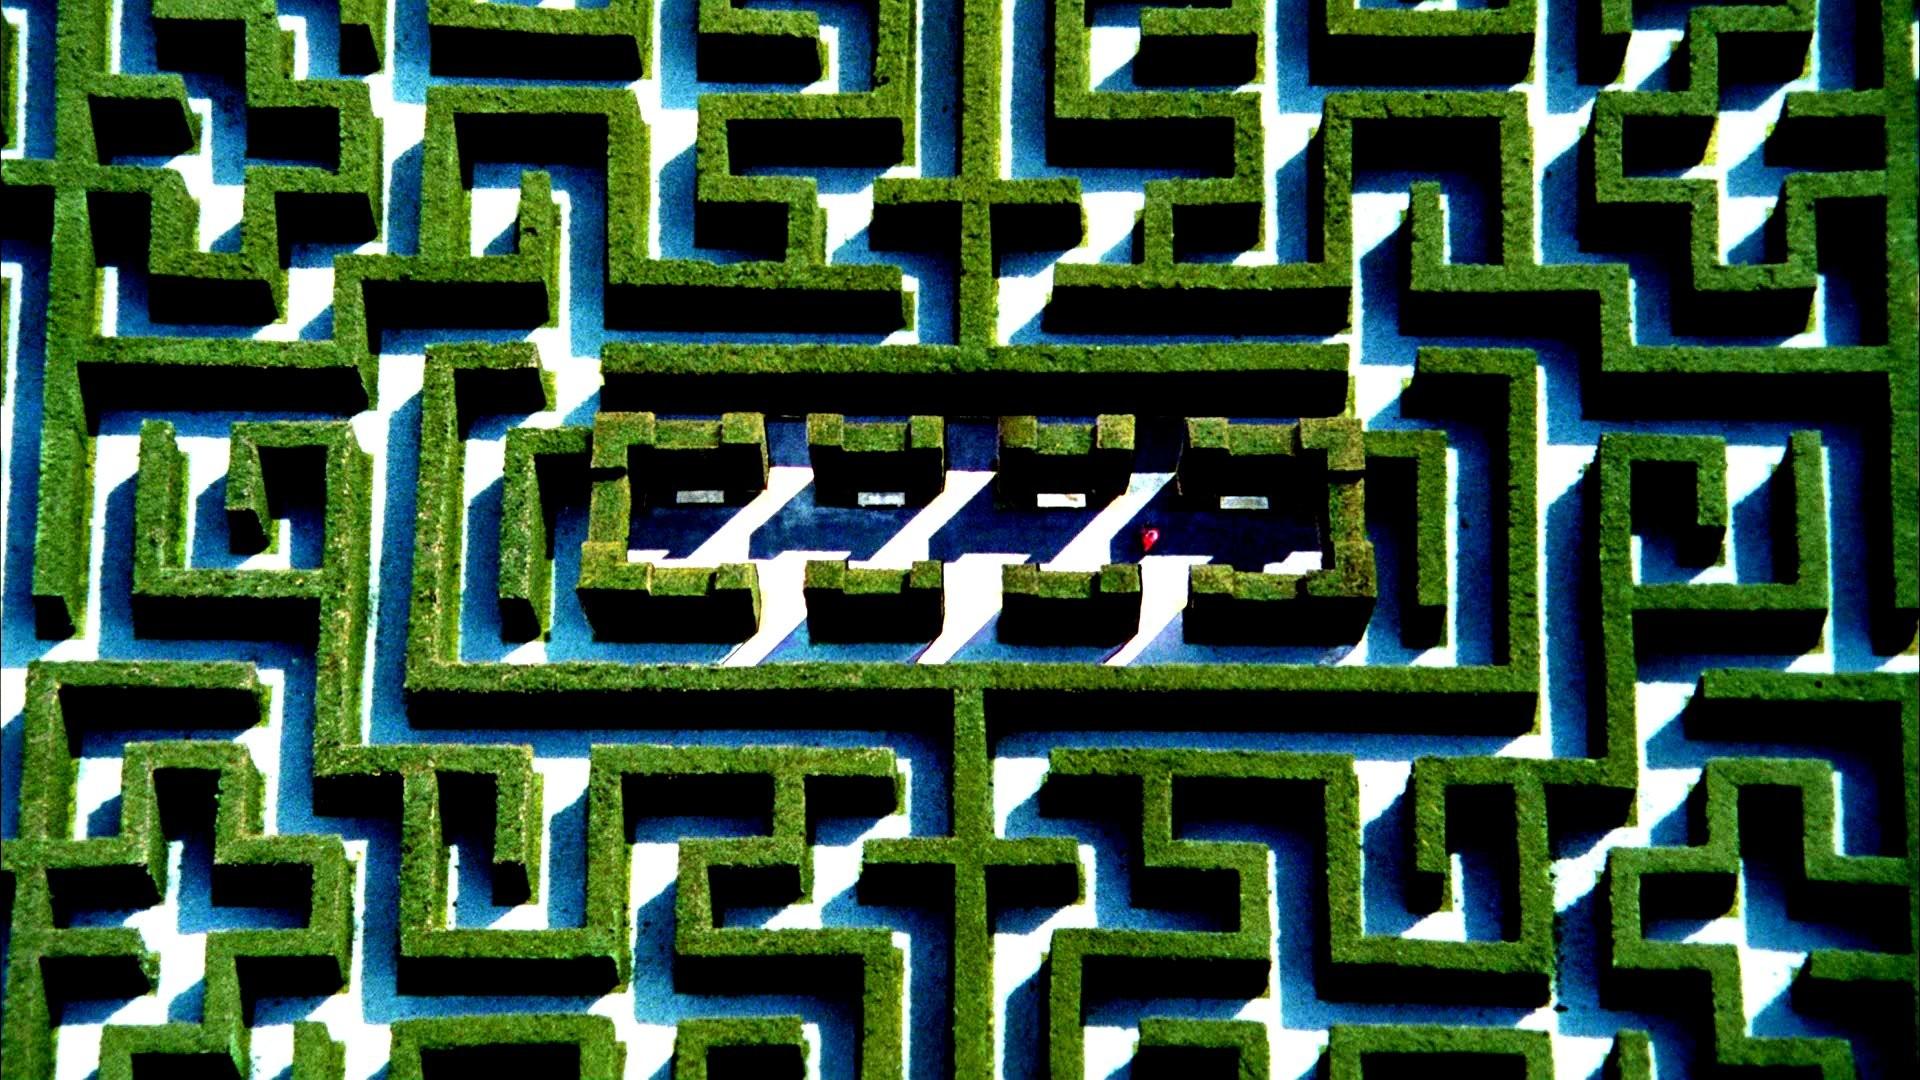 THE SHINING horror thriller dark movie film classic psychedelic maze  pattern garden wallpaper     253378   WallpaperUP